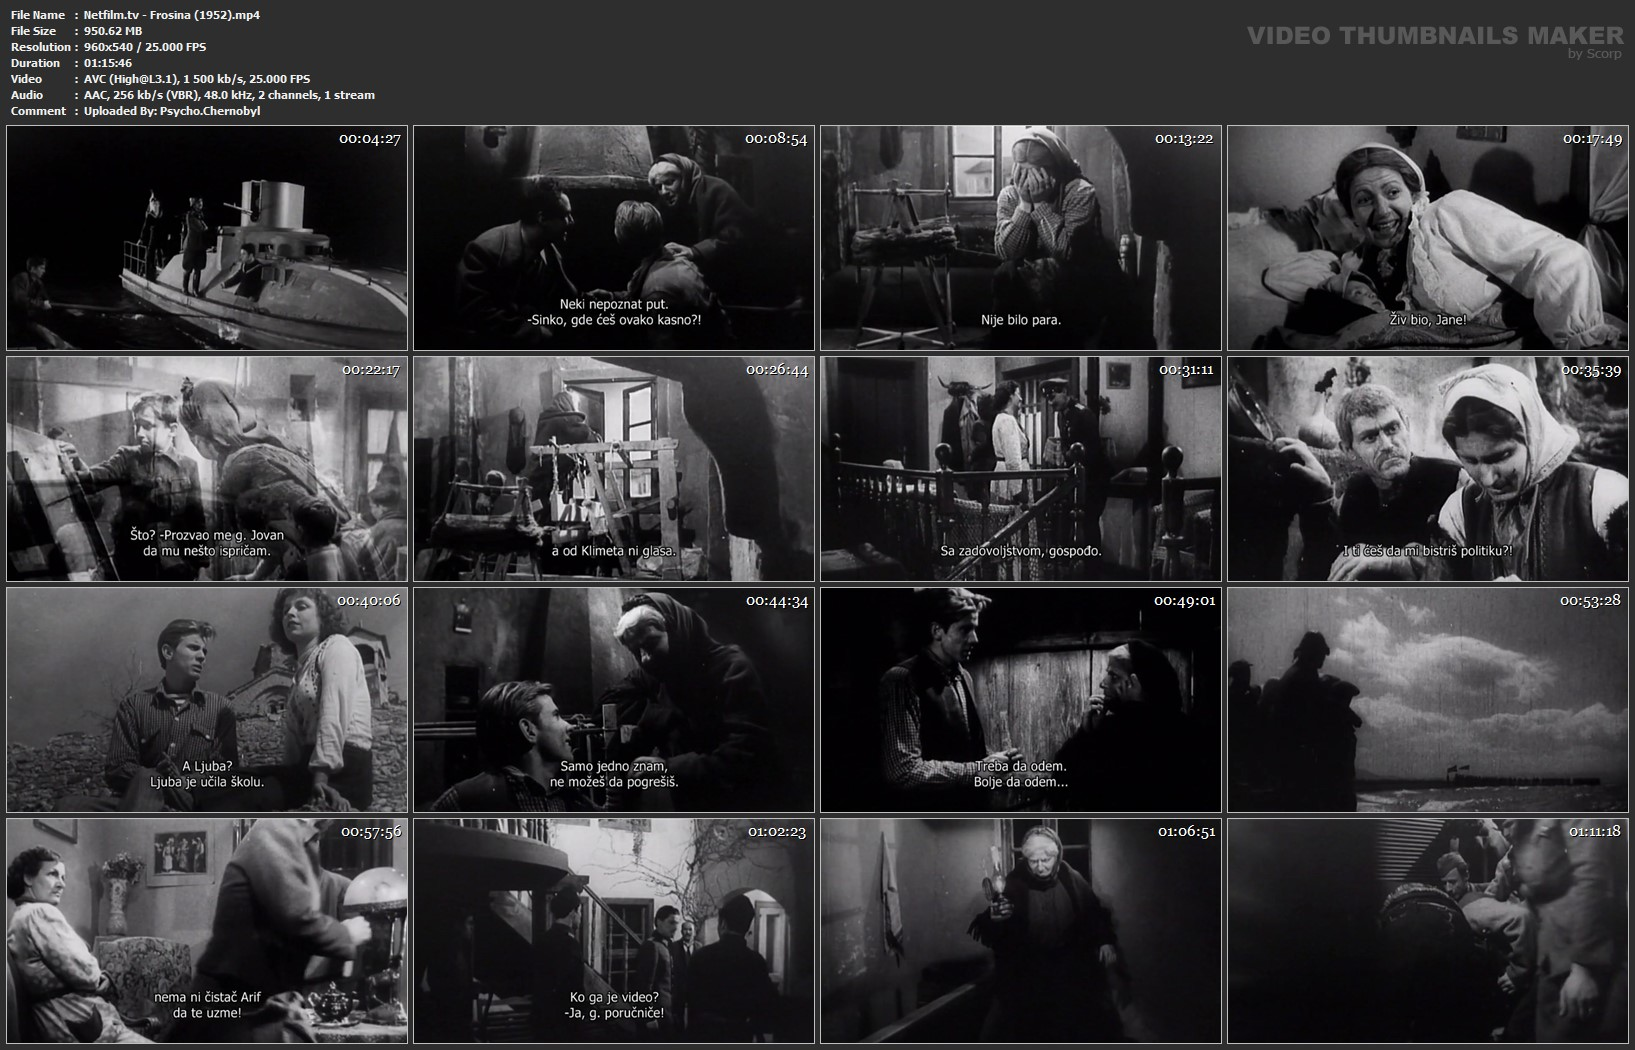 Netfilm-tv-Frosina-1952-mp4.jpg